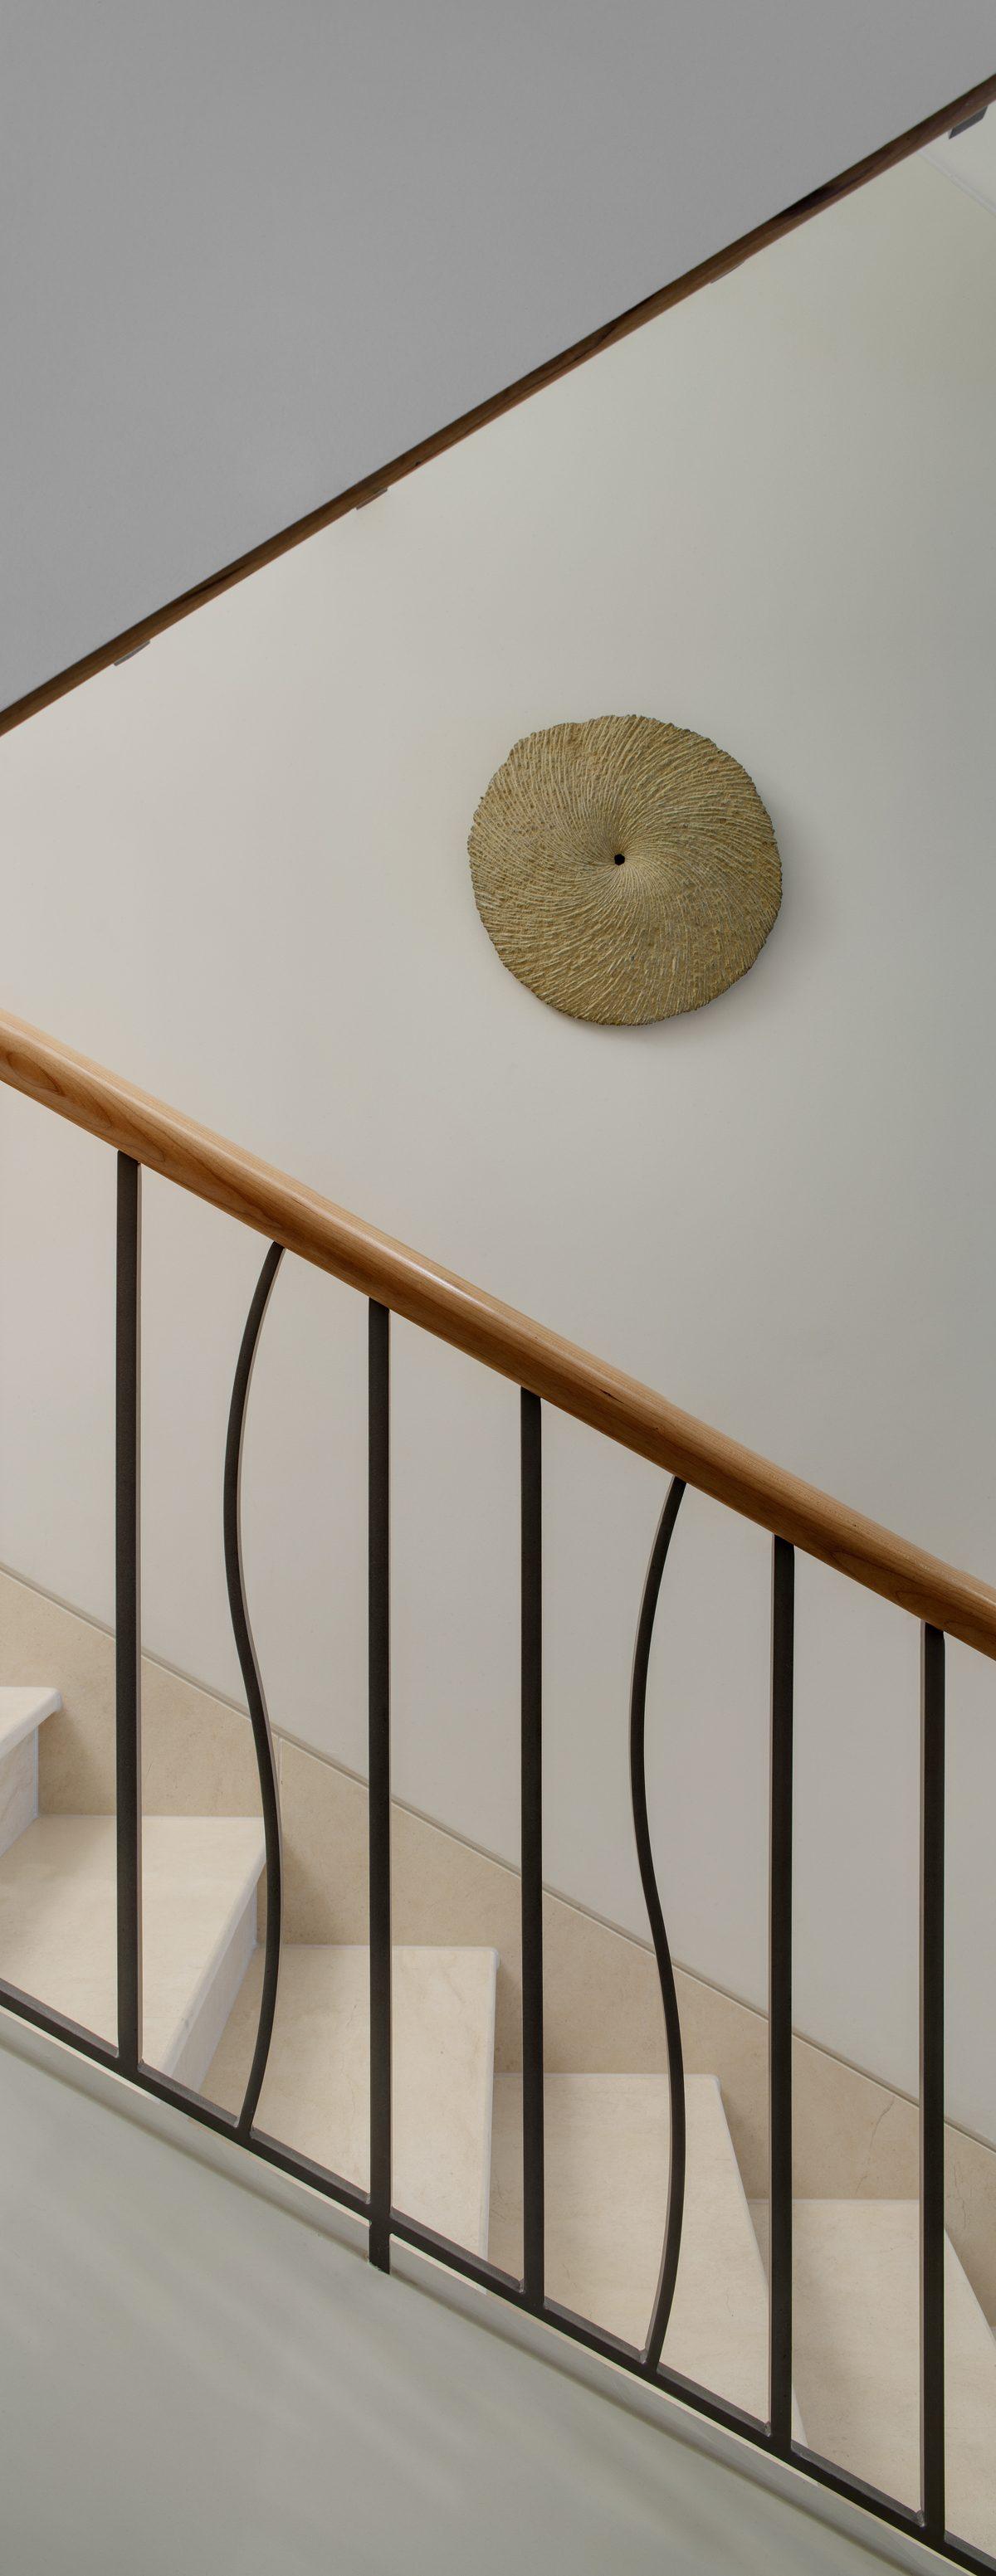 Residential House - Staircase Design - Interior